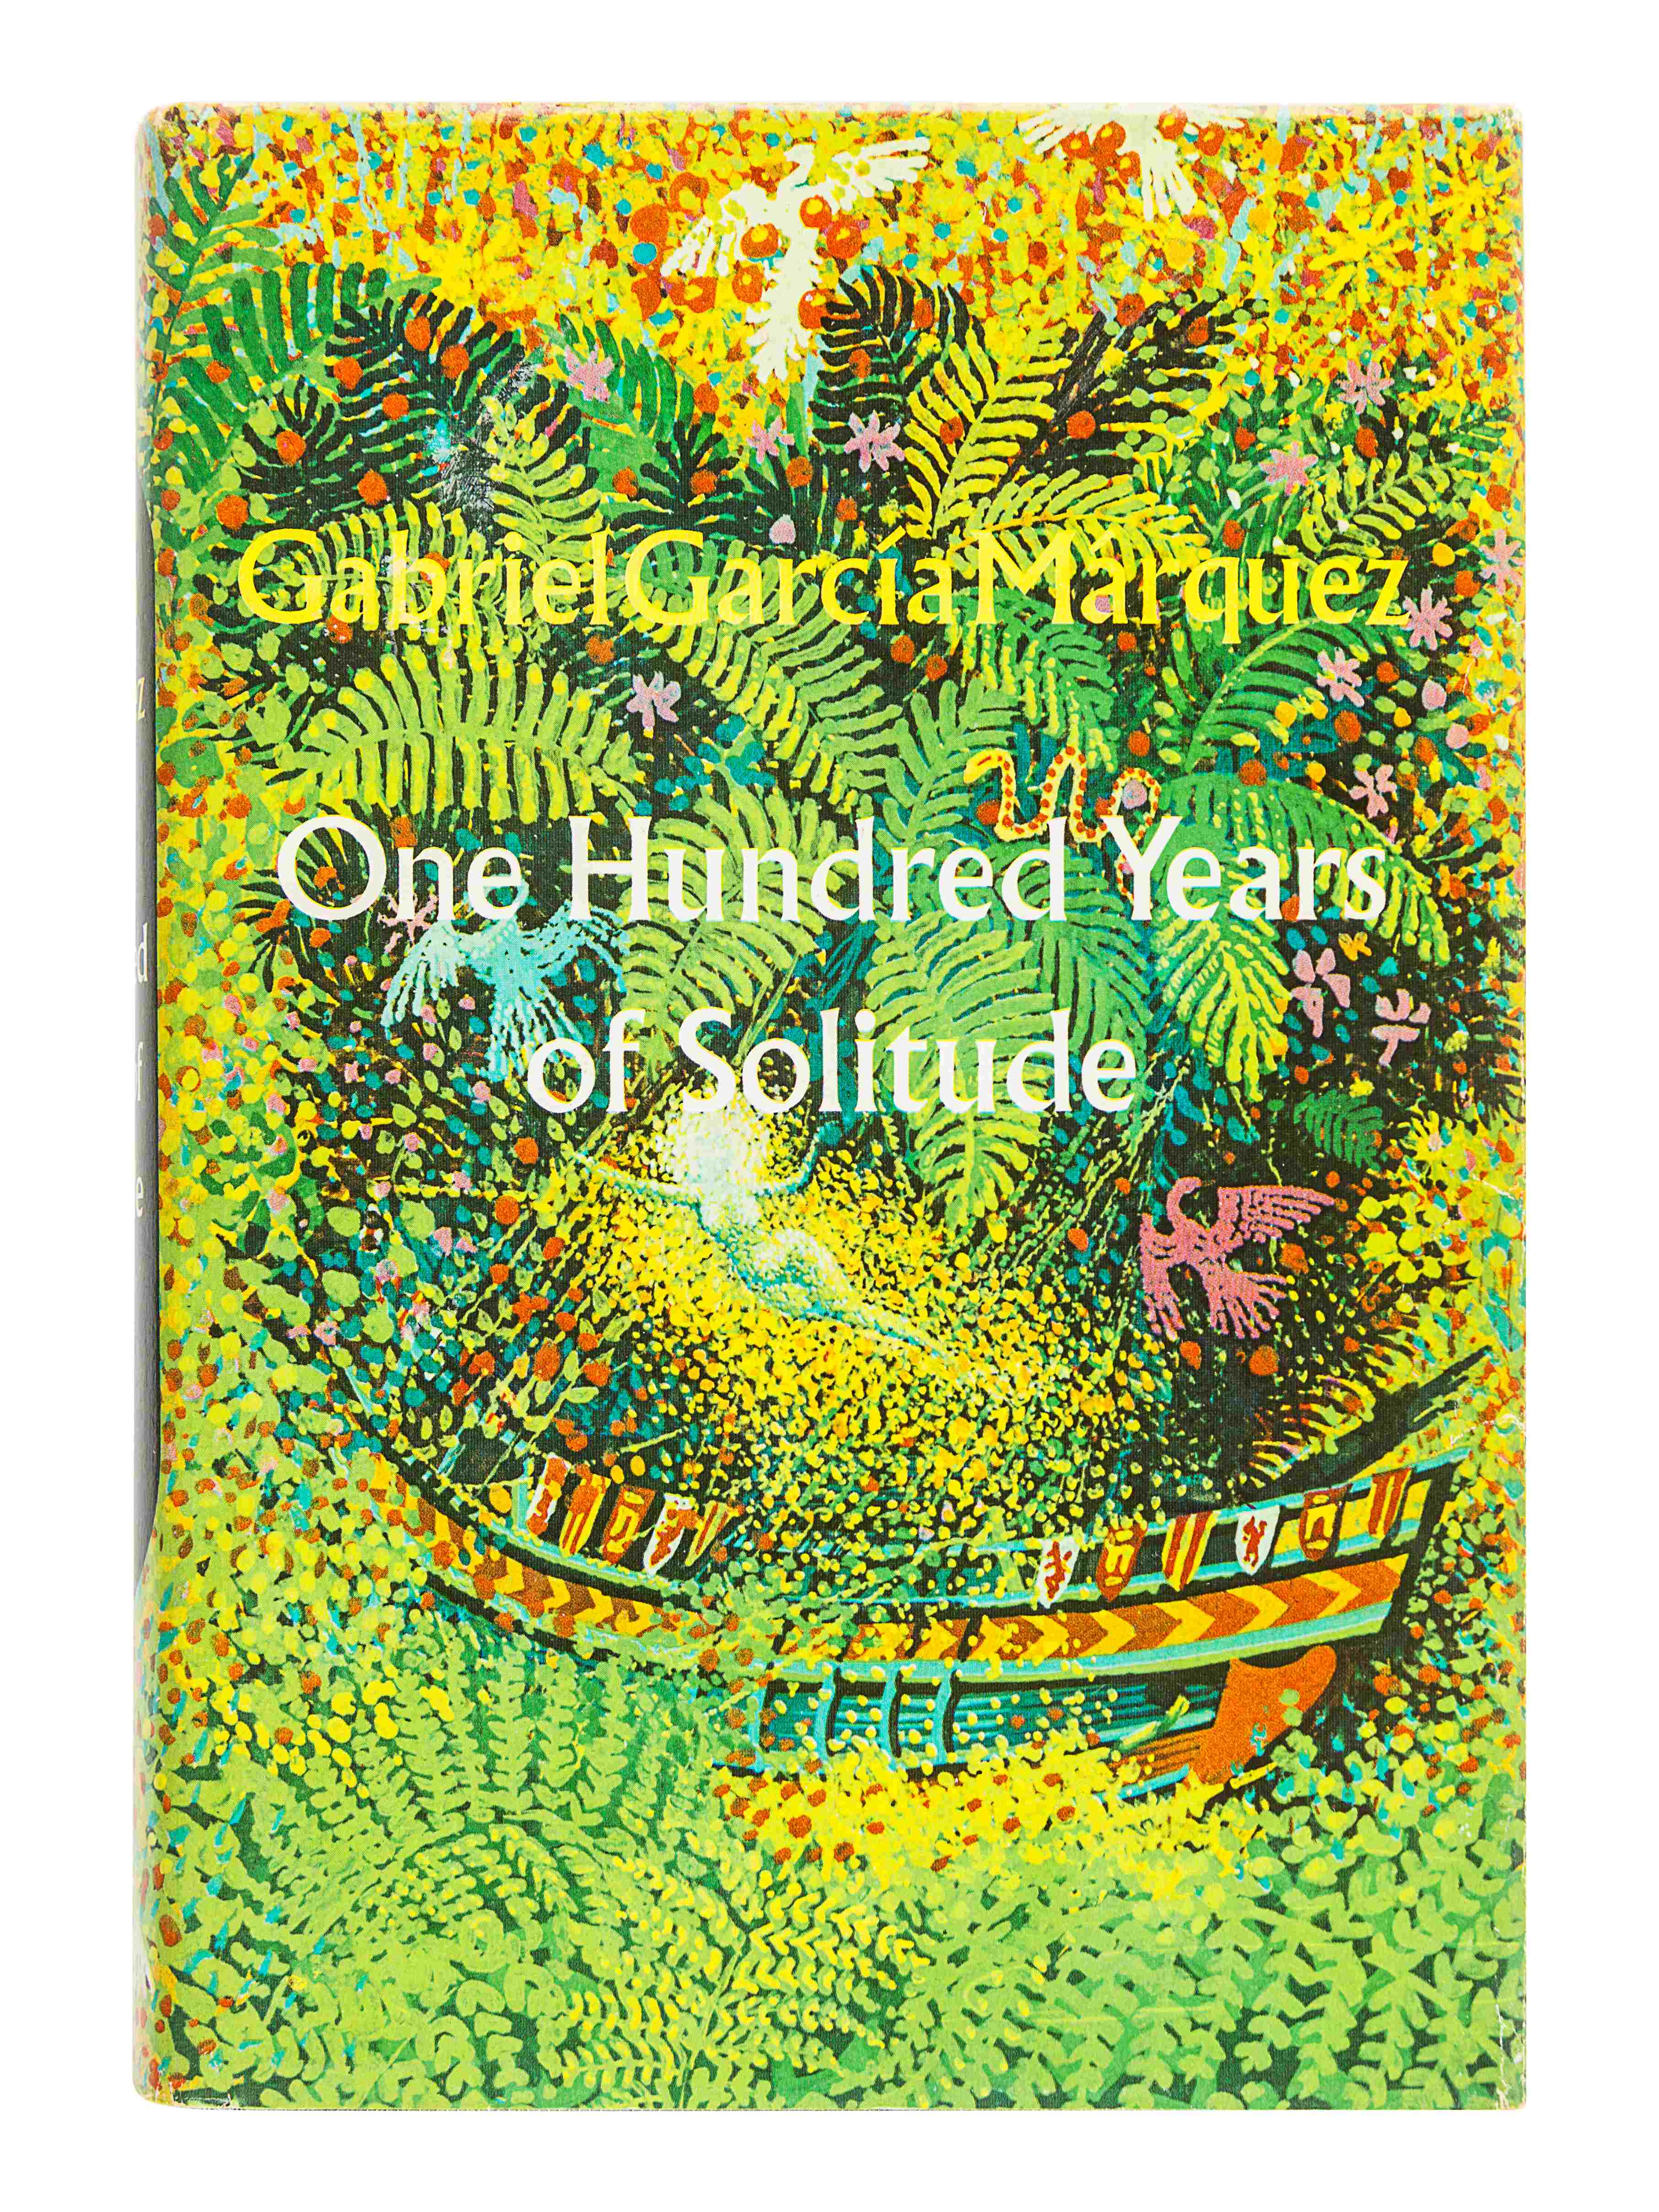 GARCIA MARQUEZ, Gabriel (1927-2014). One Hundred Years of Solitude. Gregory Rabassa, translator. New